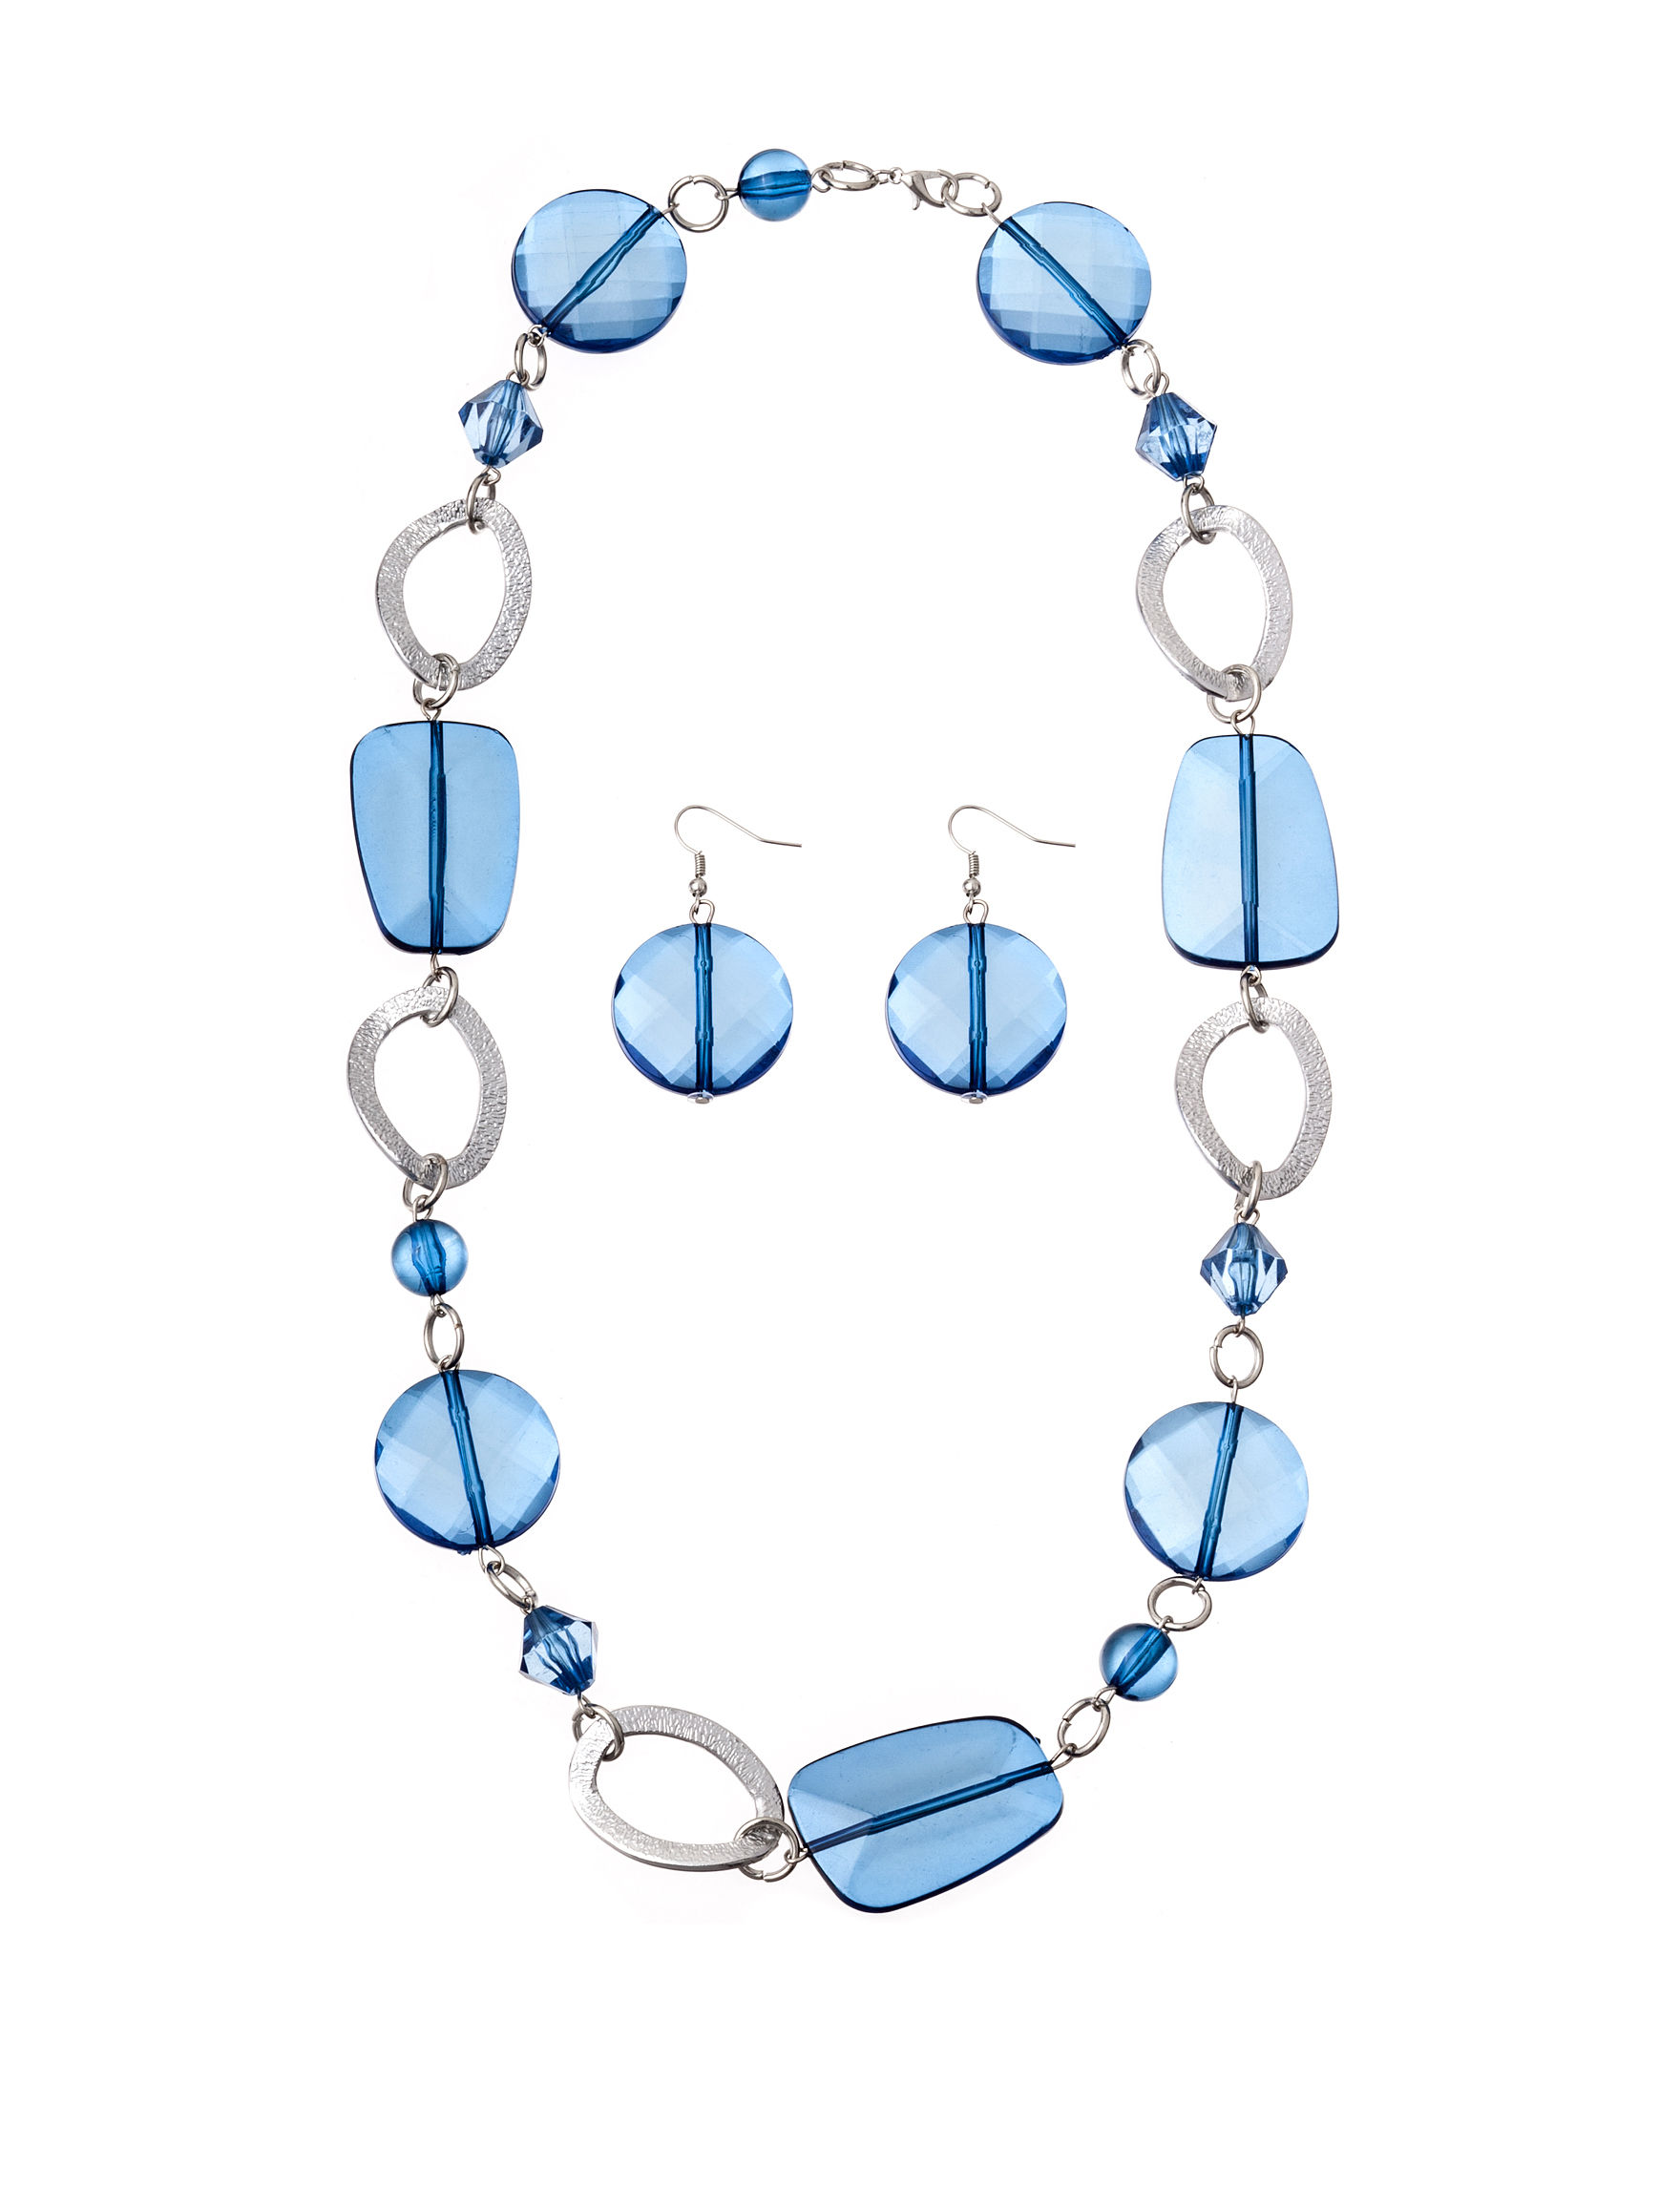 Hannah Blue Drops Earrings Jewelry Sets Necklaces & Pendants Fashion Jewelry